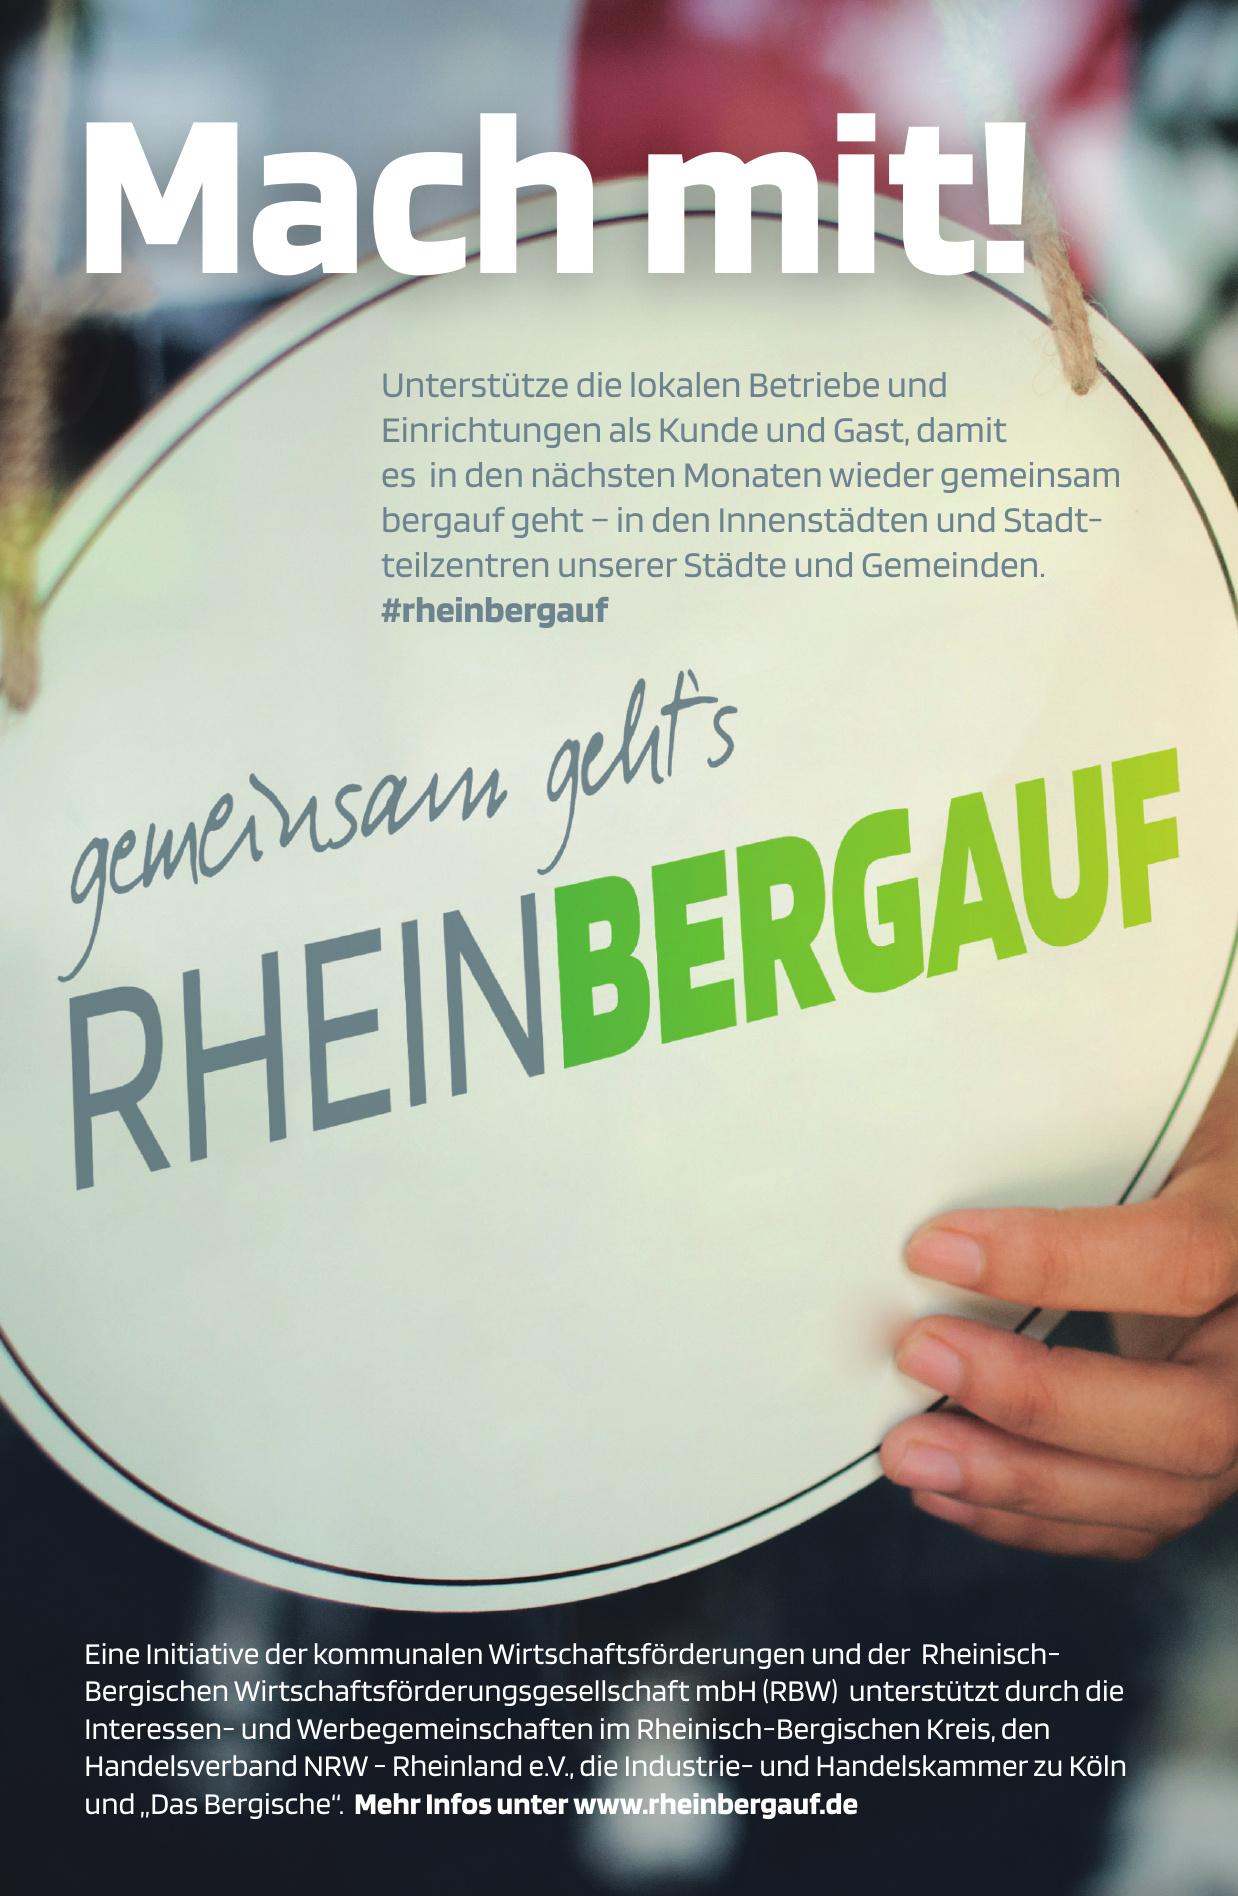 Rheinberg auf